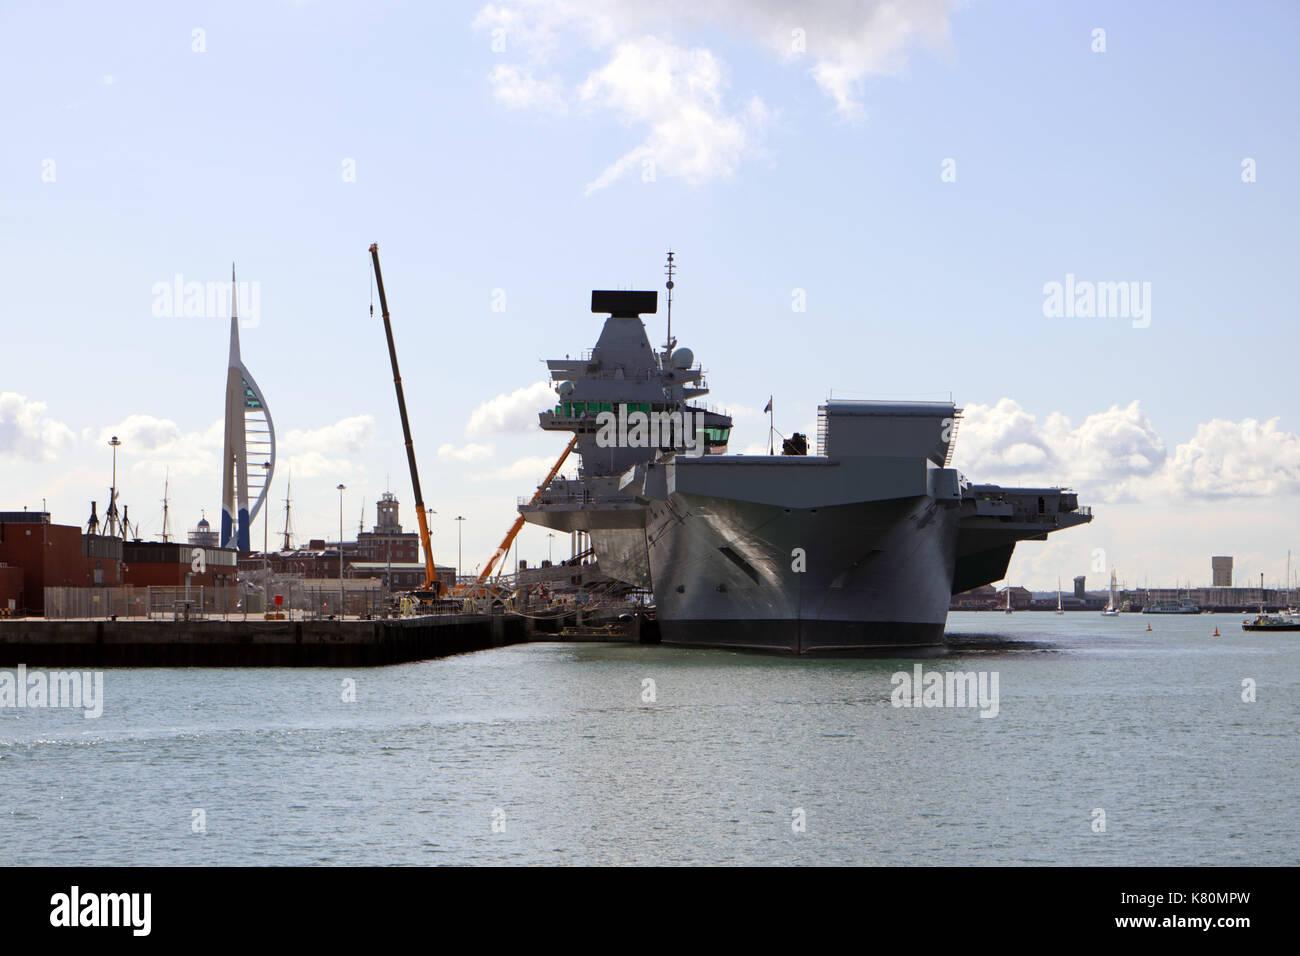 HMS Queen Elizabeth at Portsmouth Harbour - Stock Image